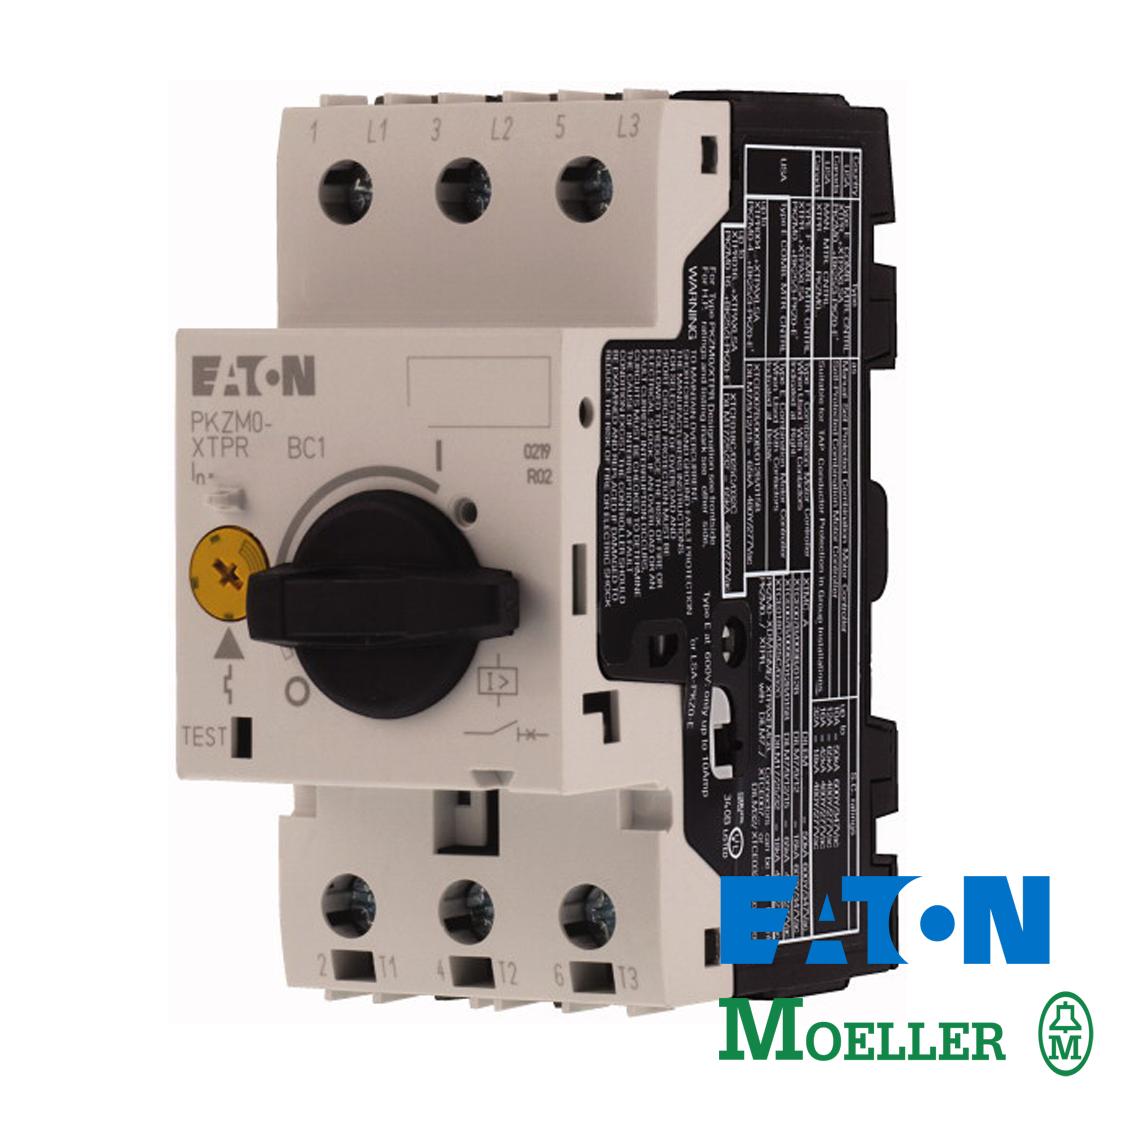 Motorni zaštitni prekidač PKZM0-2,5 Eaton-Moeller Elektro Vukojevic